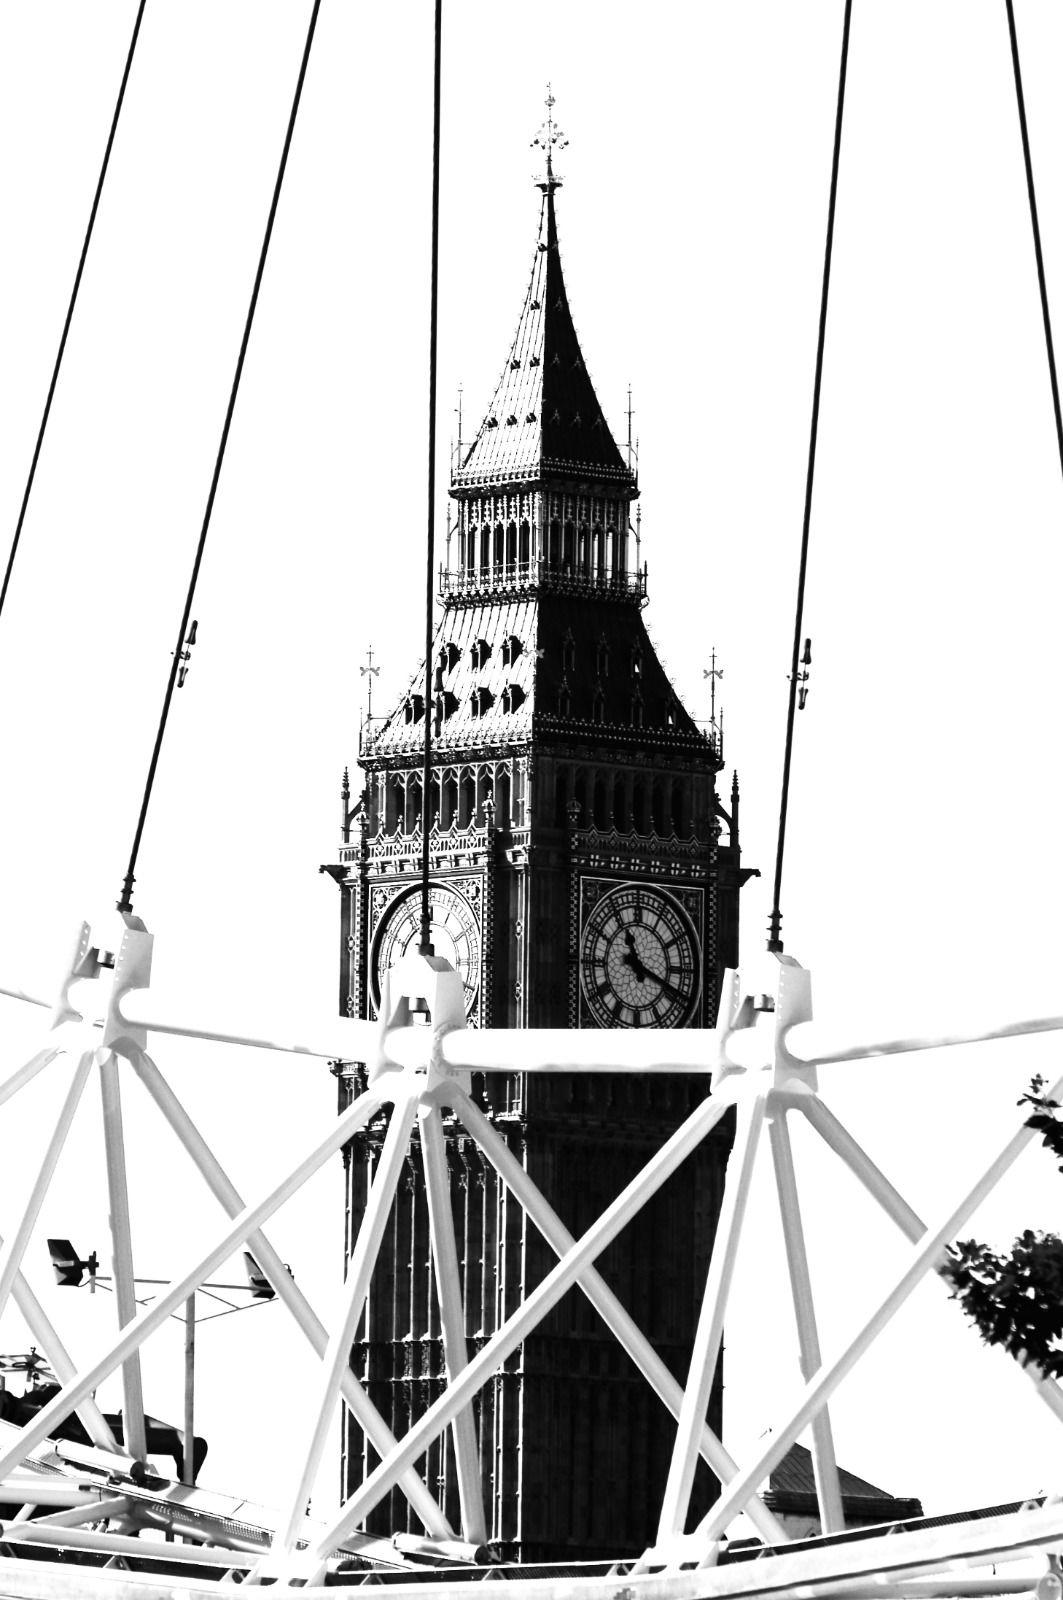 local london area photo big ben and london eye